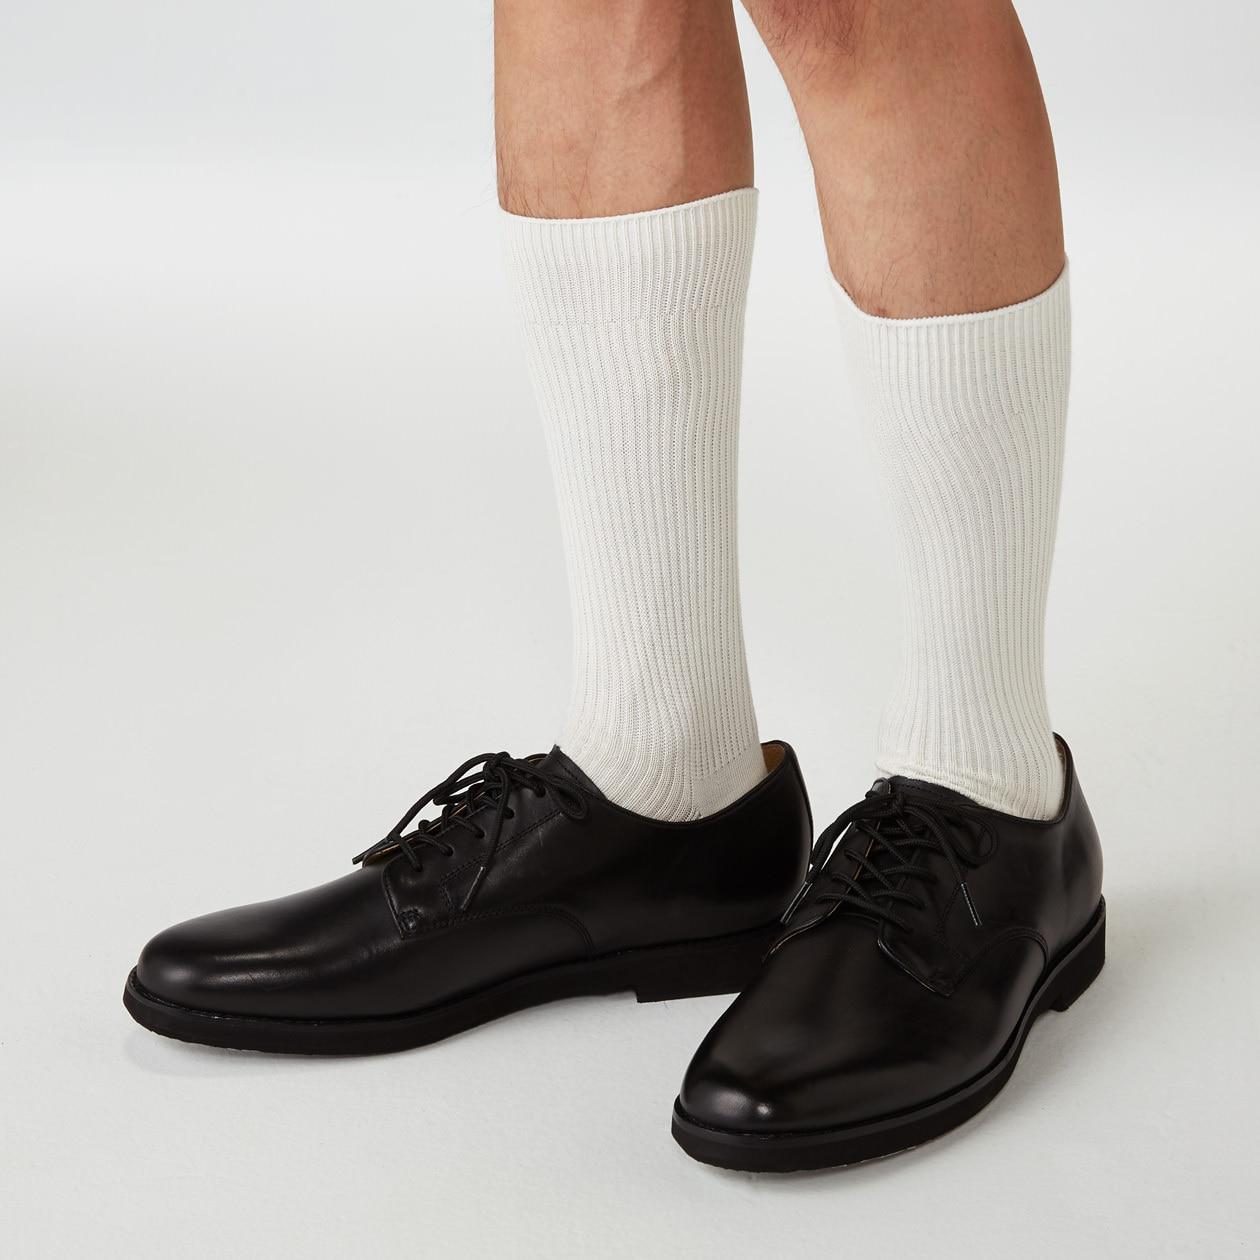 889d9ae67 Men's Organic Cotton Mix Right Angle Rib Socks | 無印良品 MUJI